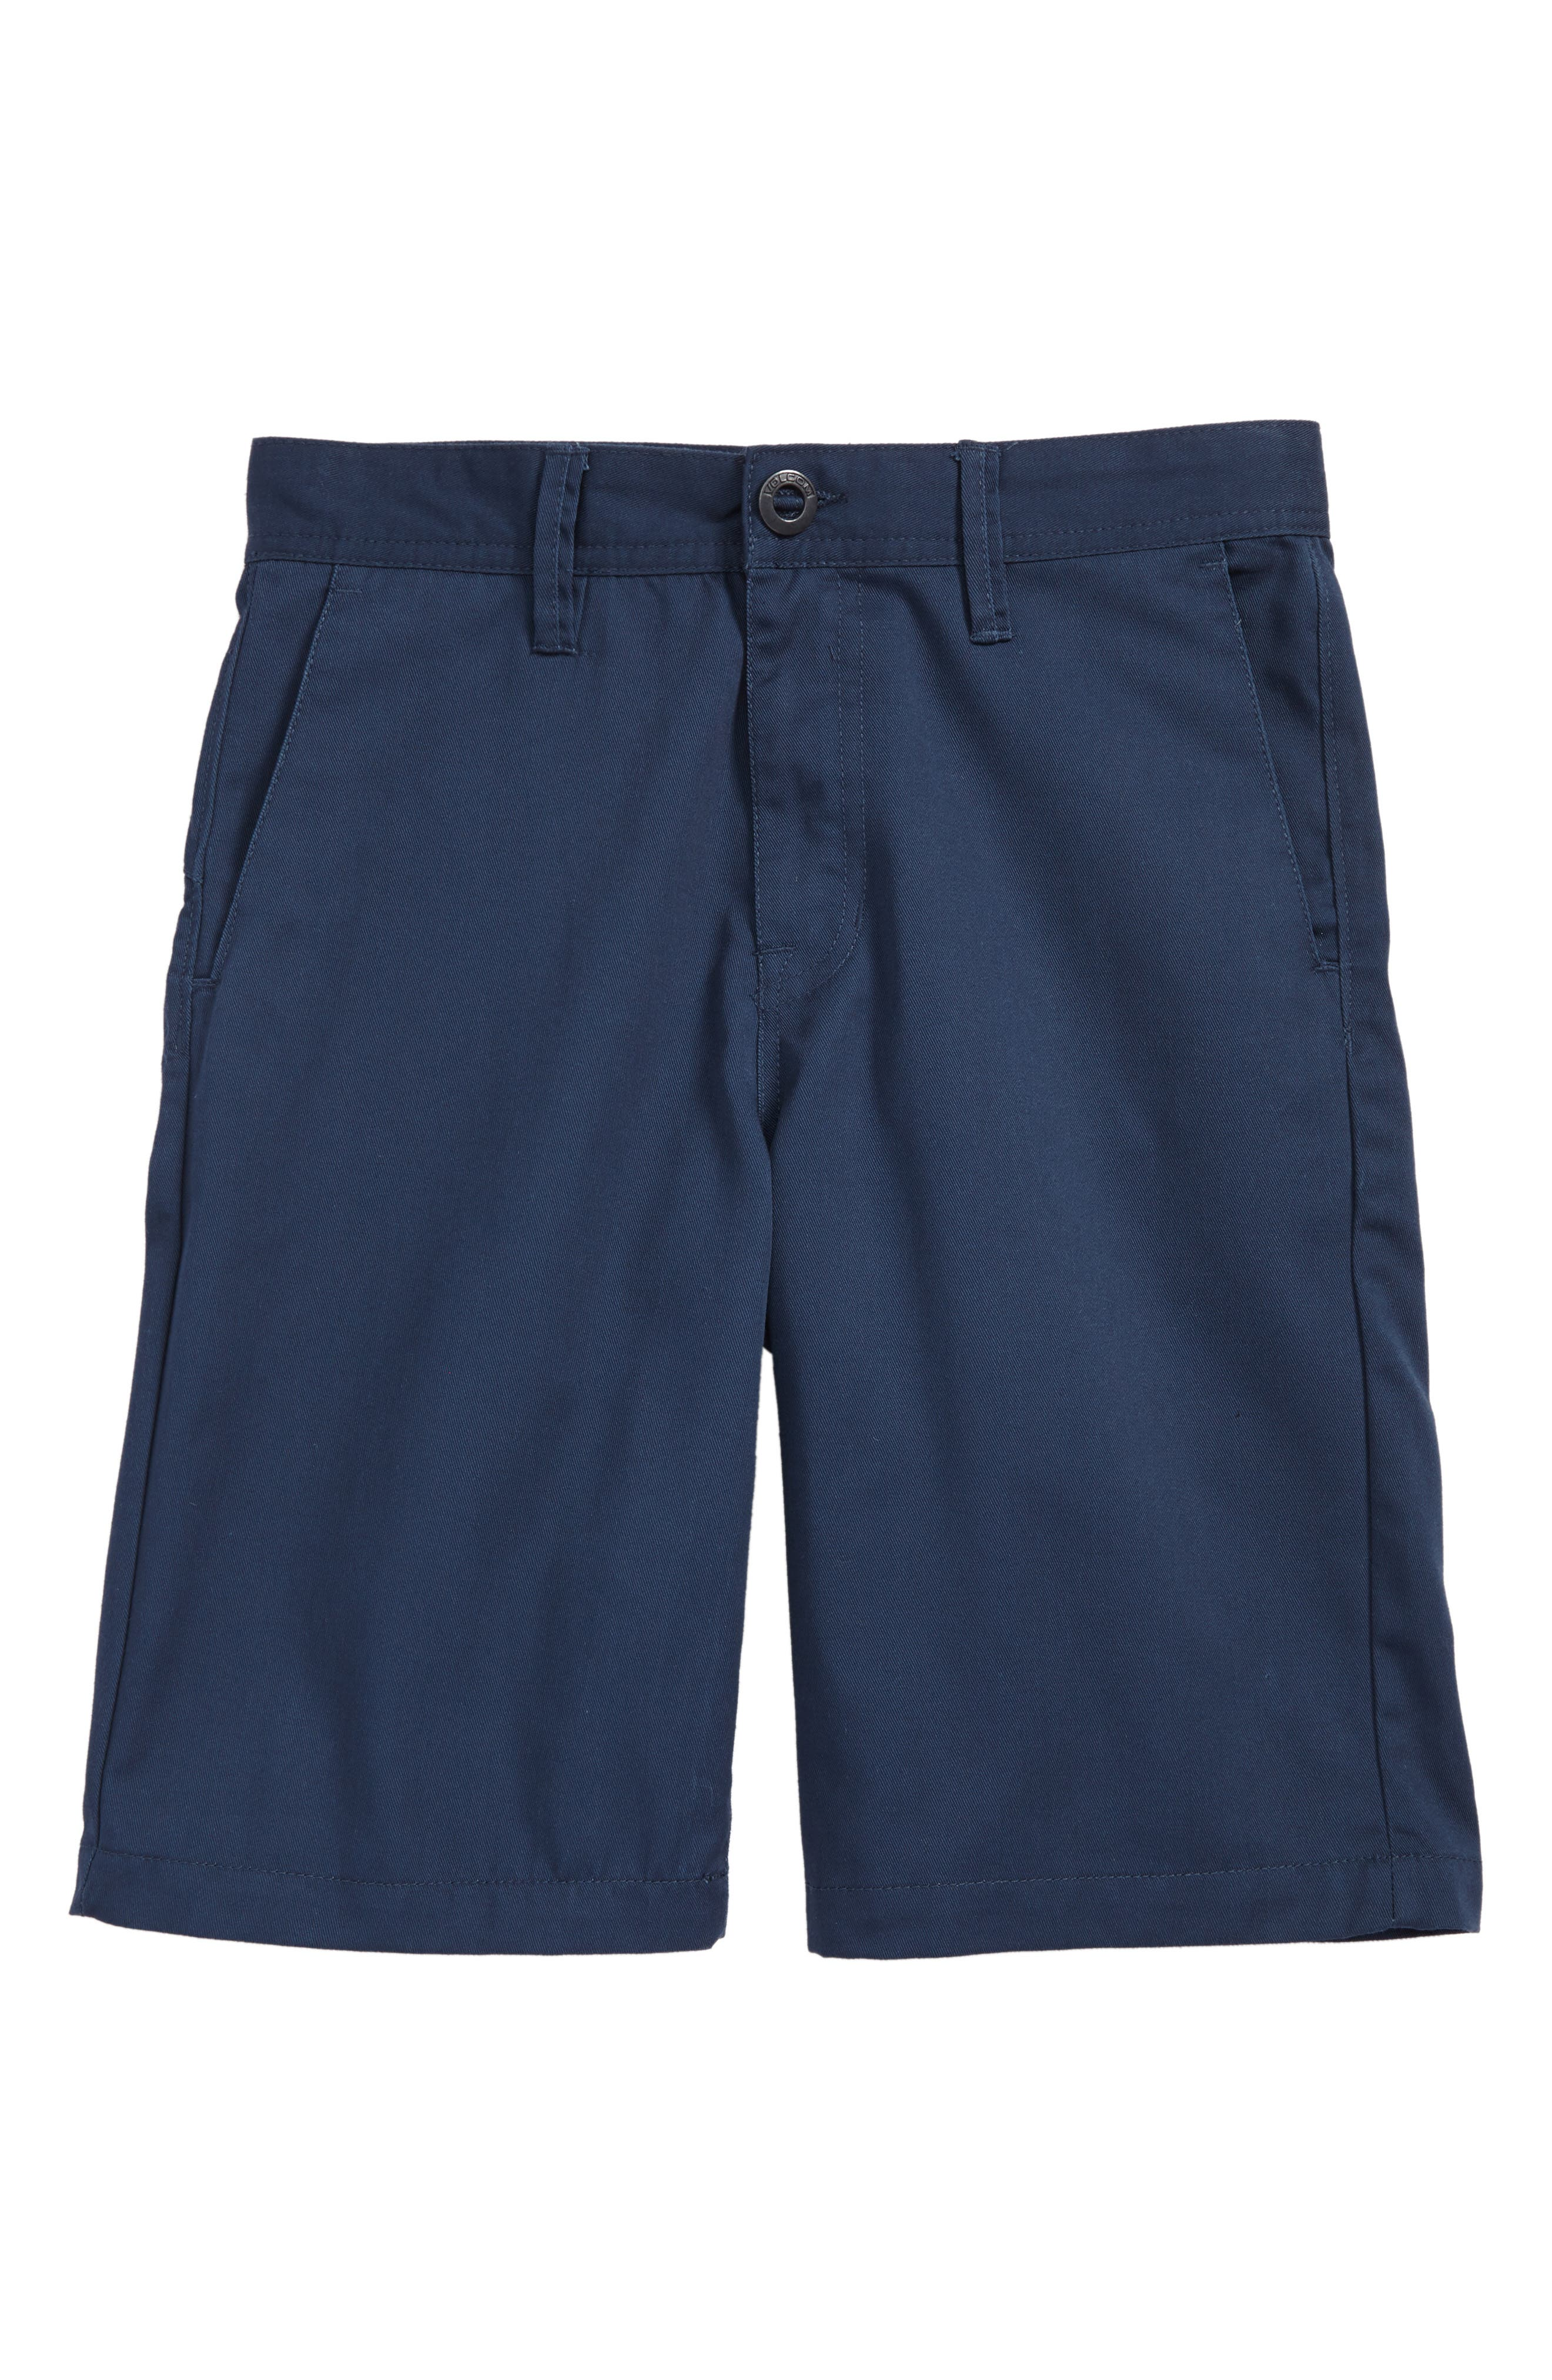 Chino Shorts,                         Main,                         color, Service Blue